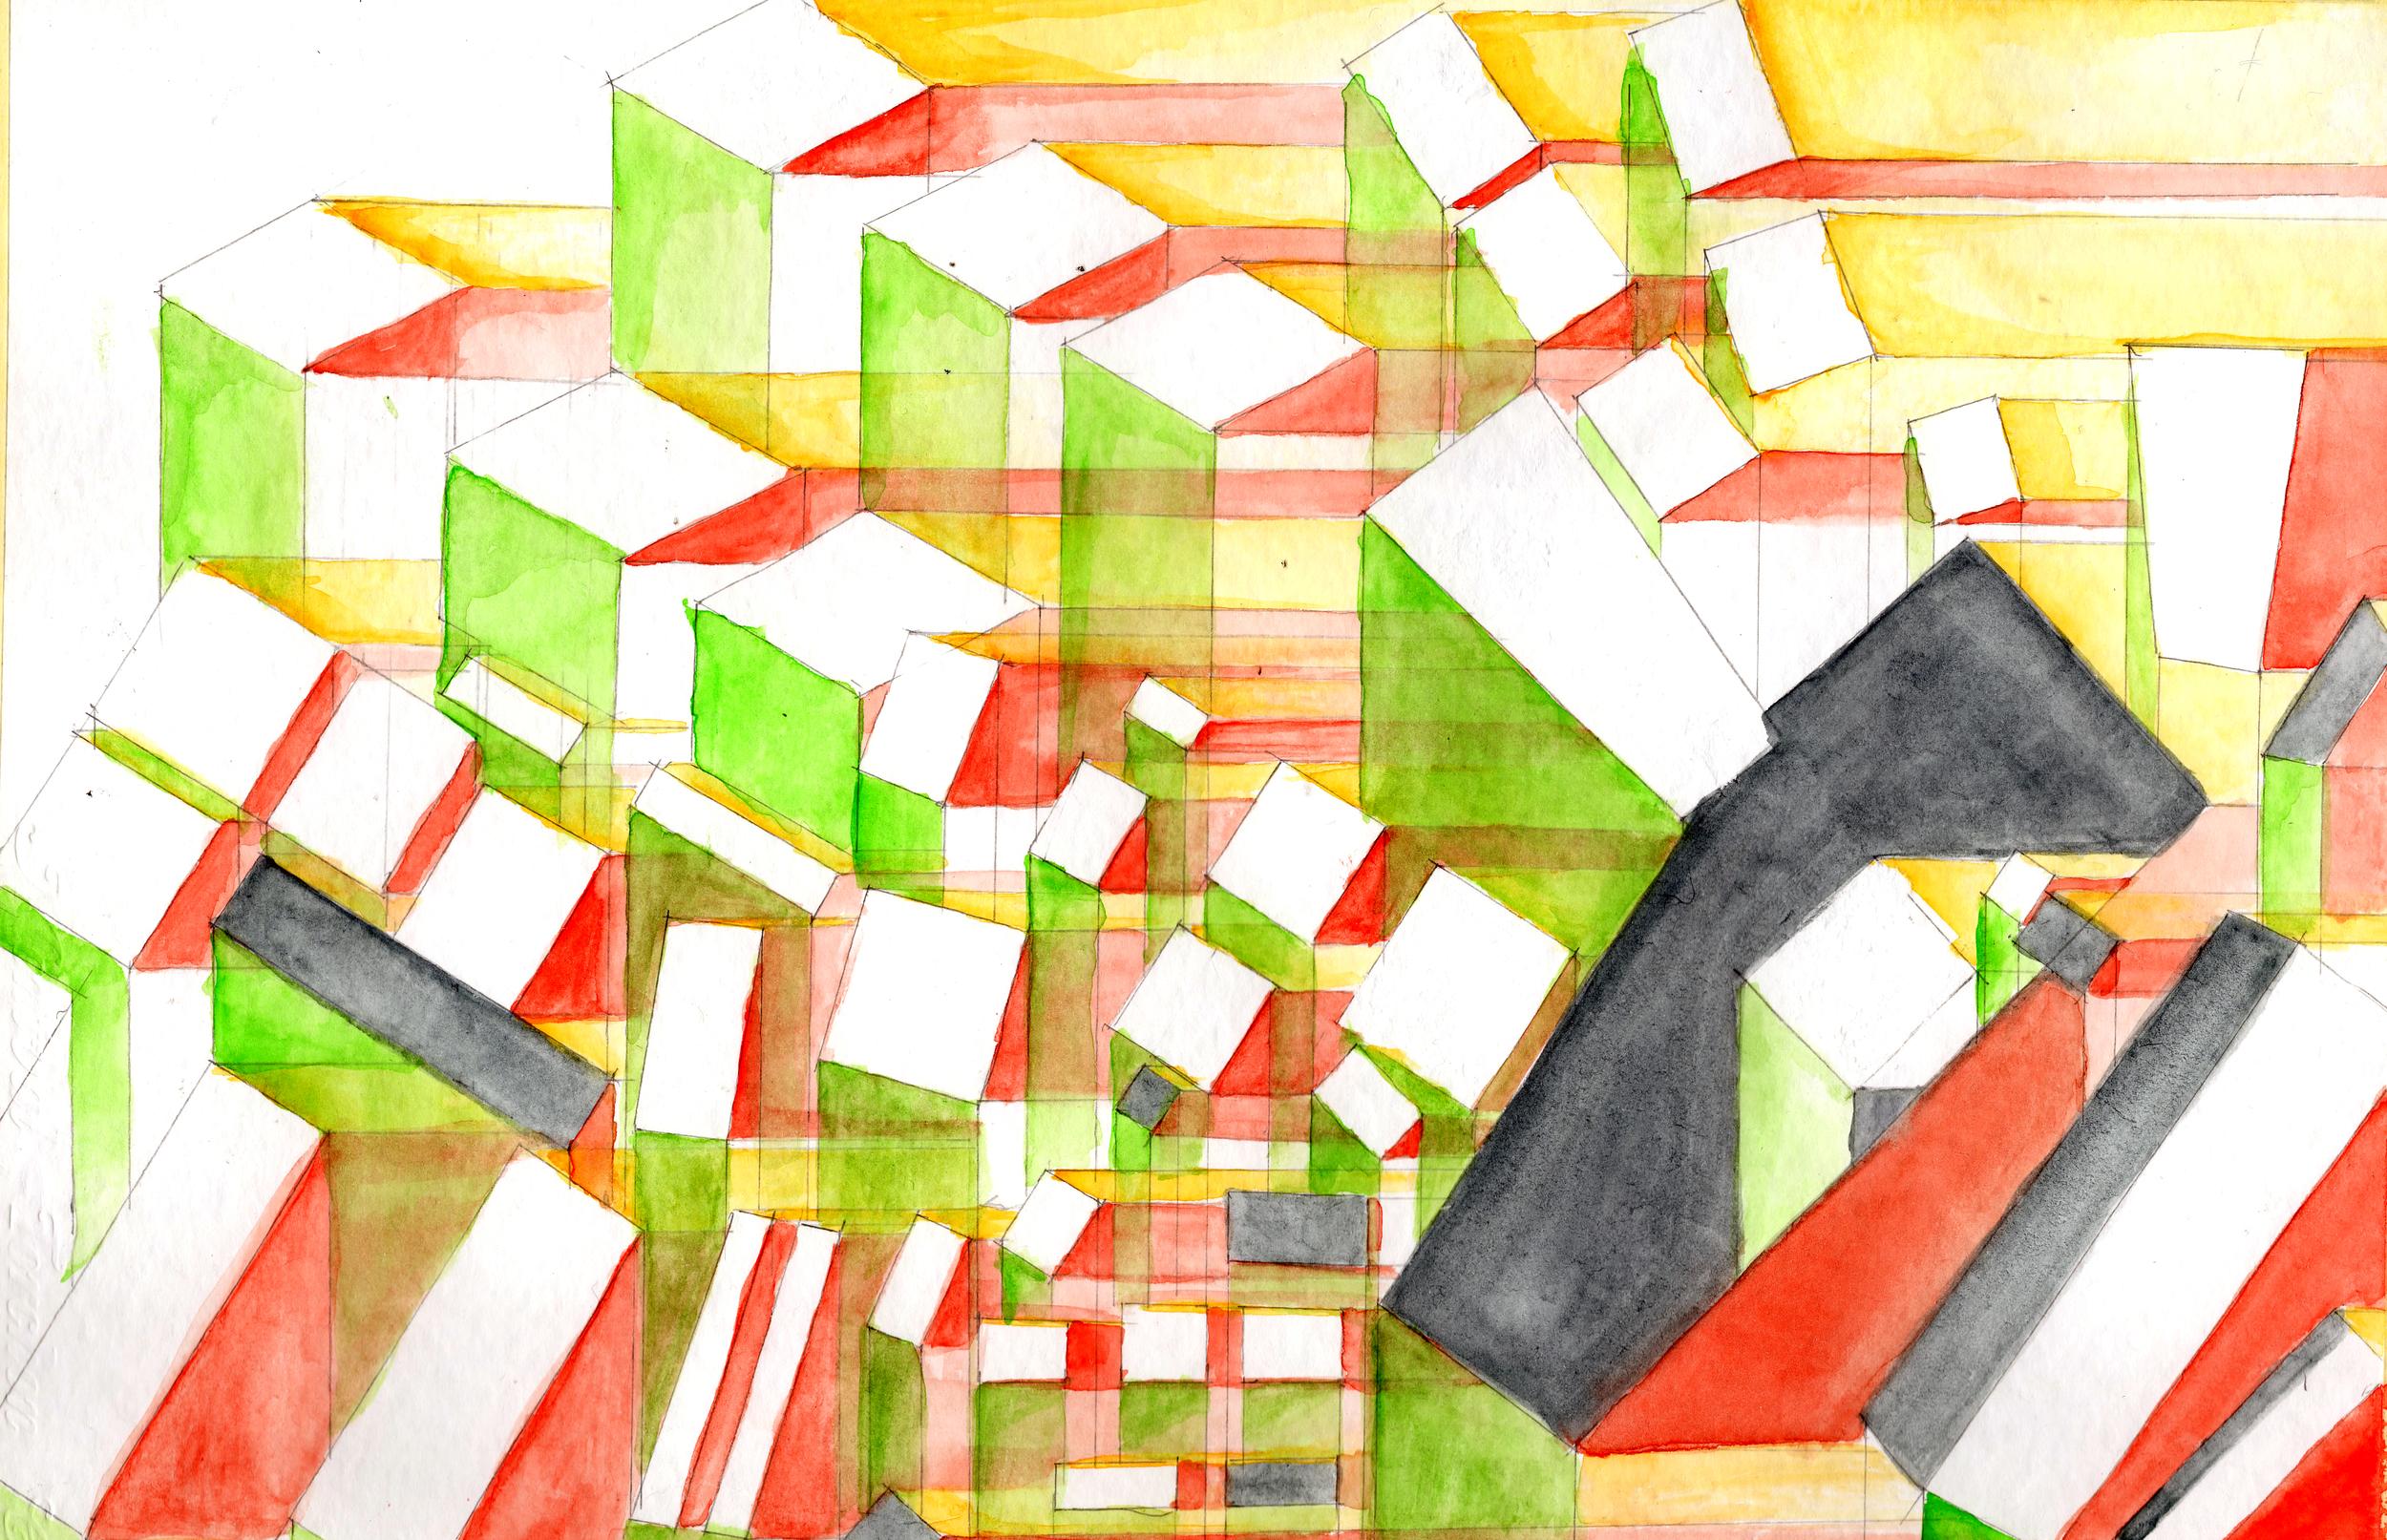 McGowan.P5.Abstraction1.jpg